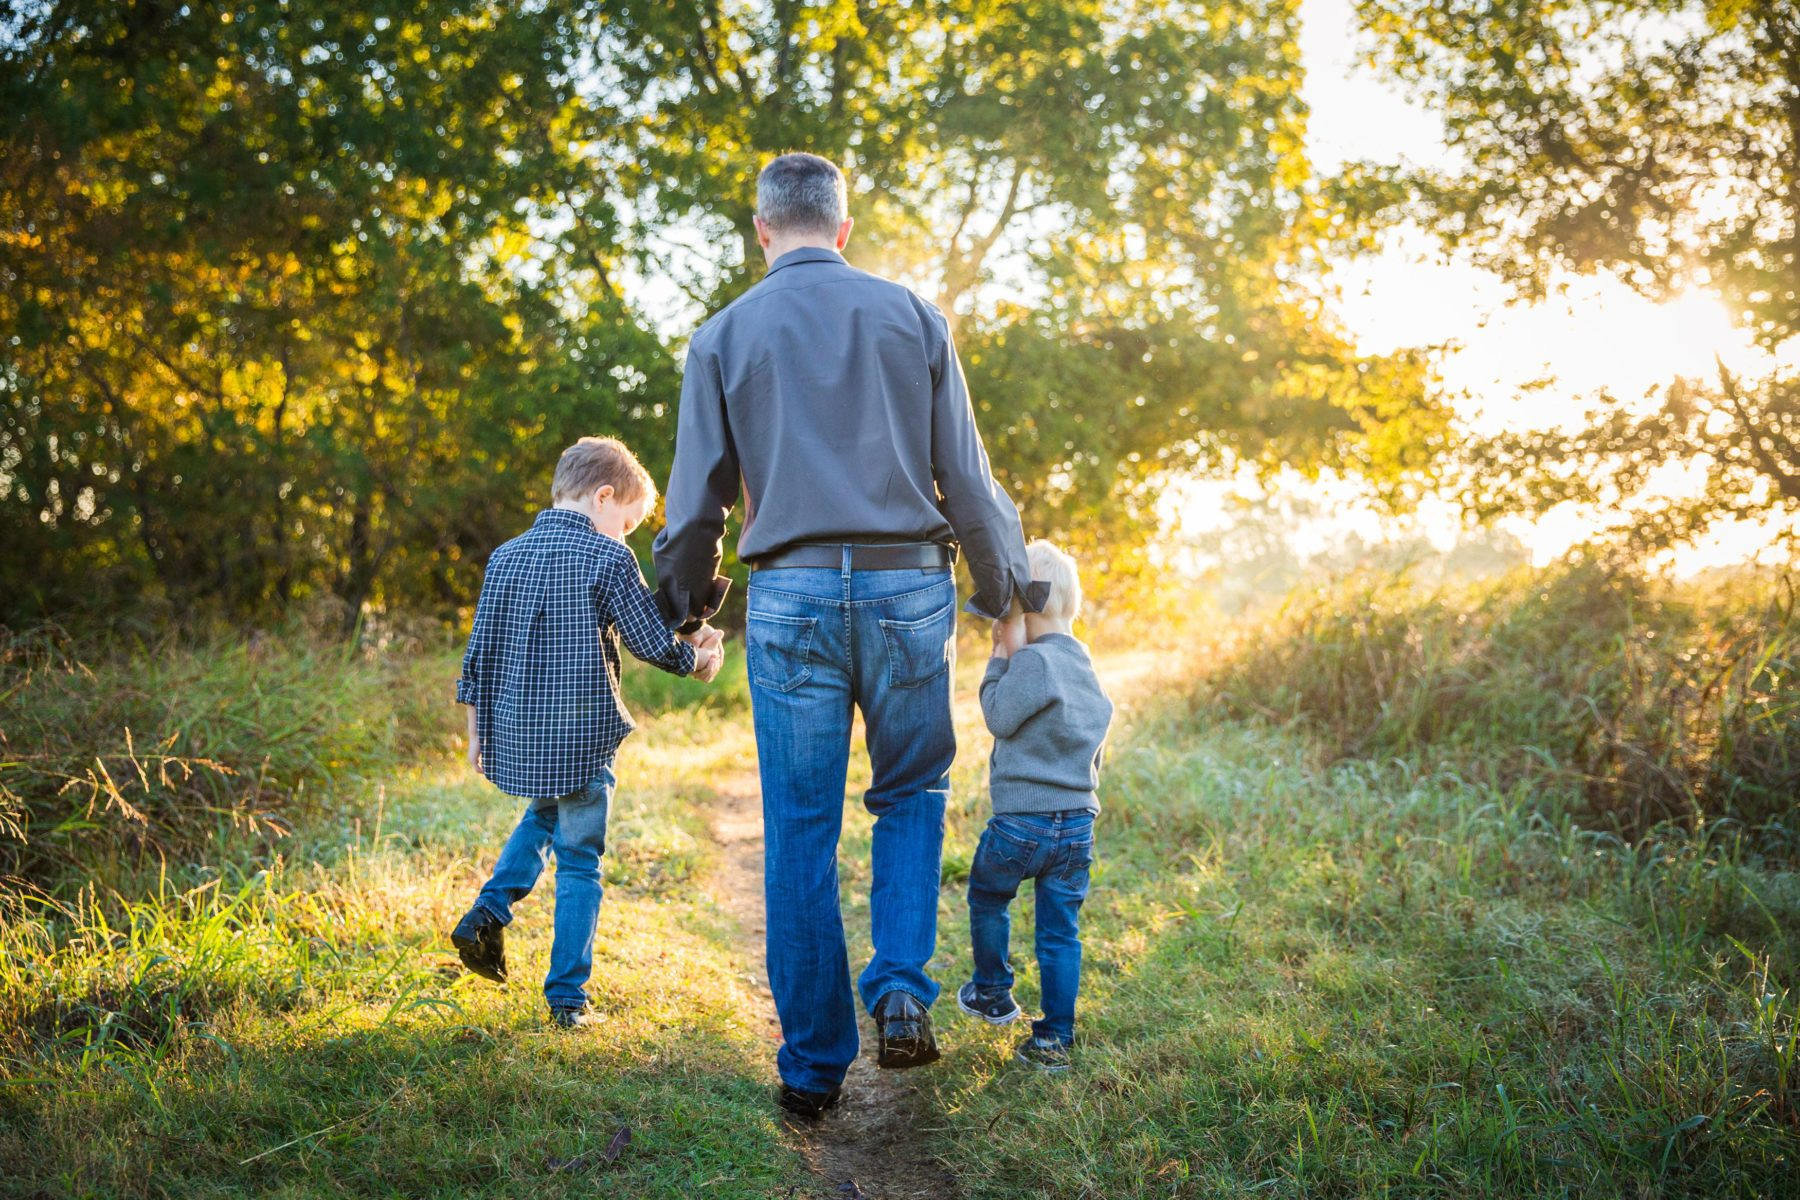 Little boys walking with dad {Family Photographer| Prosper, TX}